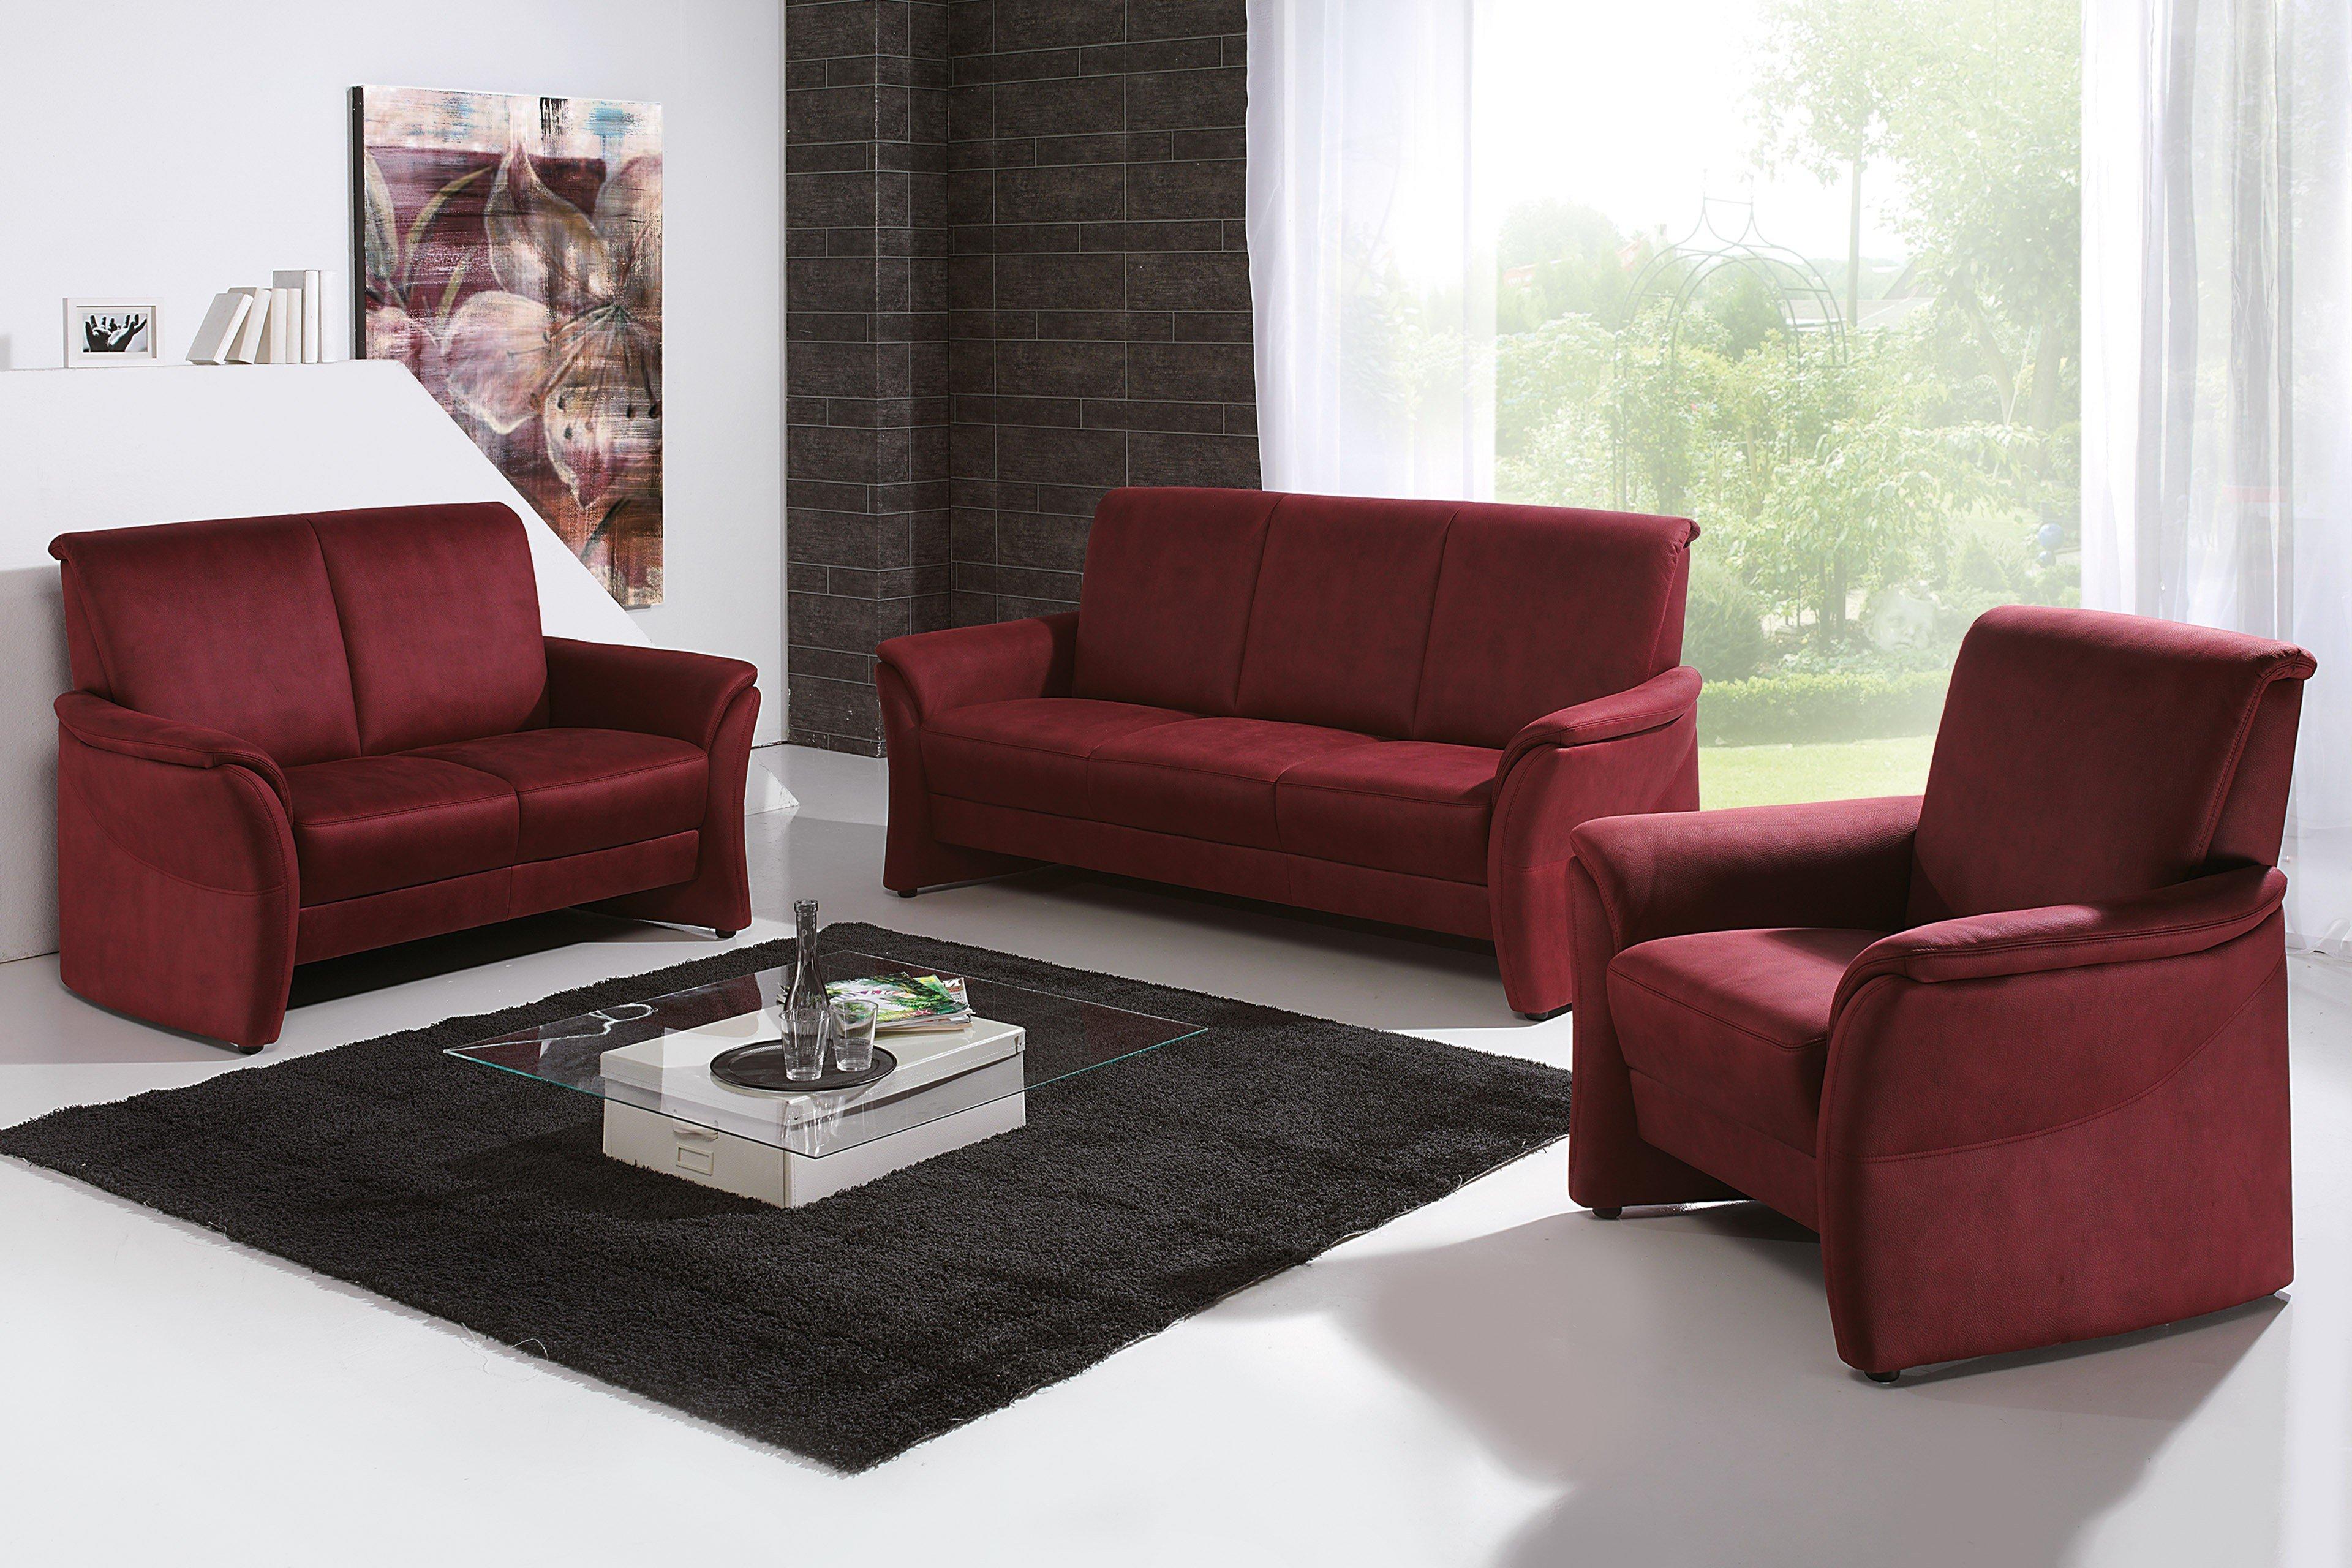 arco arosa polstergarnitur bordeaux m bel letz ihr. Black Bedroom Furniture Sets. Home Design Ideas